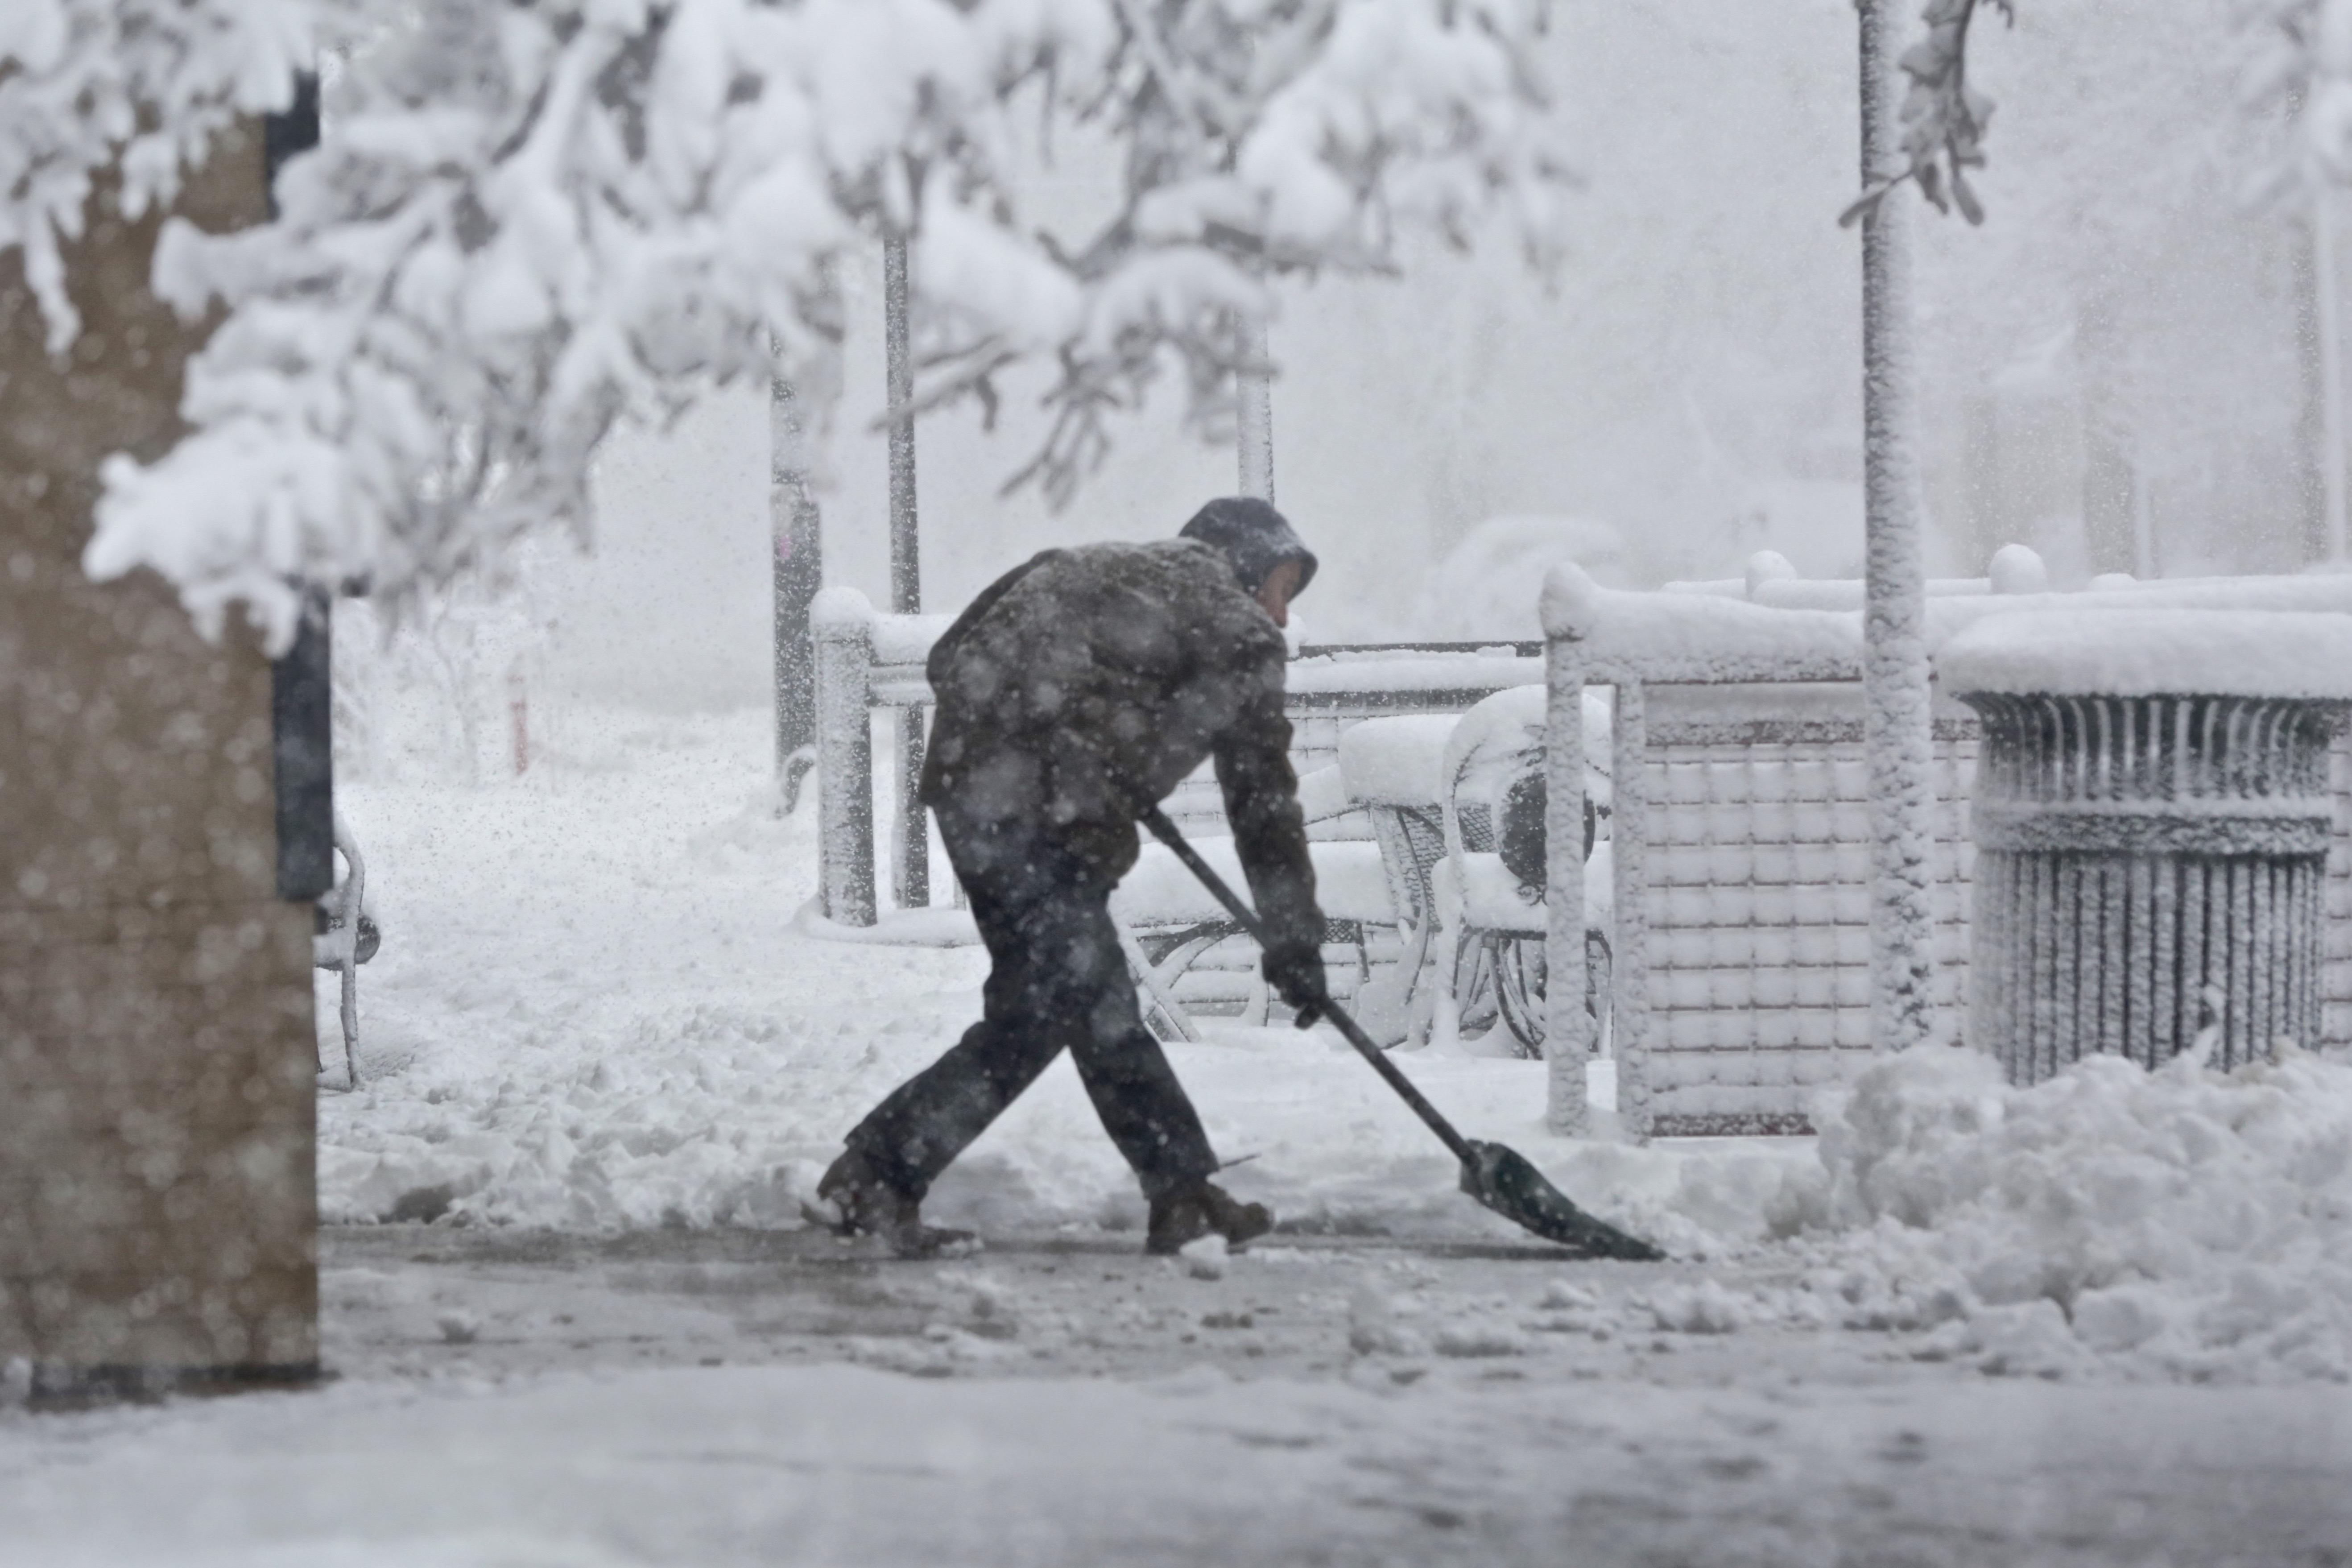 Photo: Shoveling Snow On 23rd Avenue Denver March 23 2016